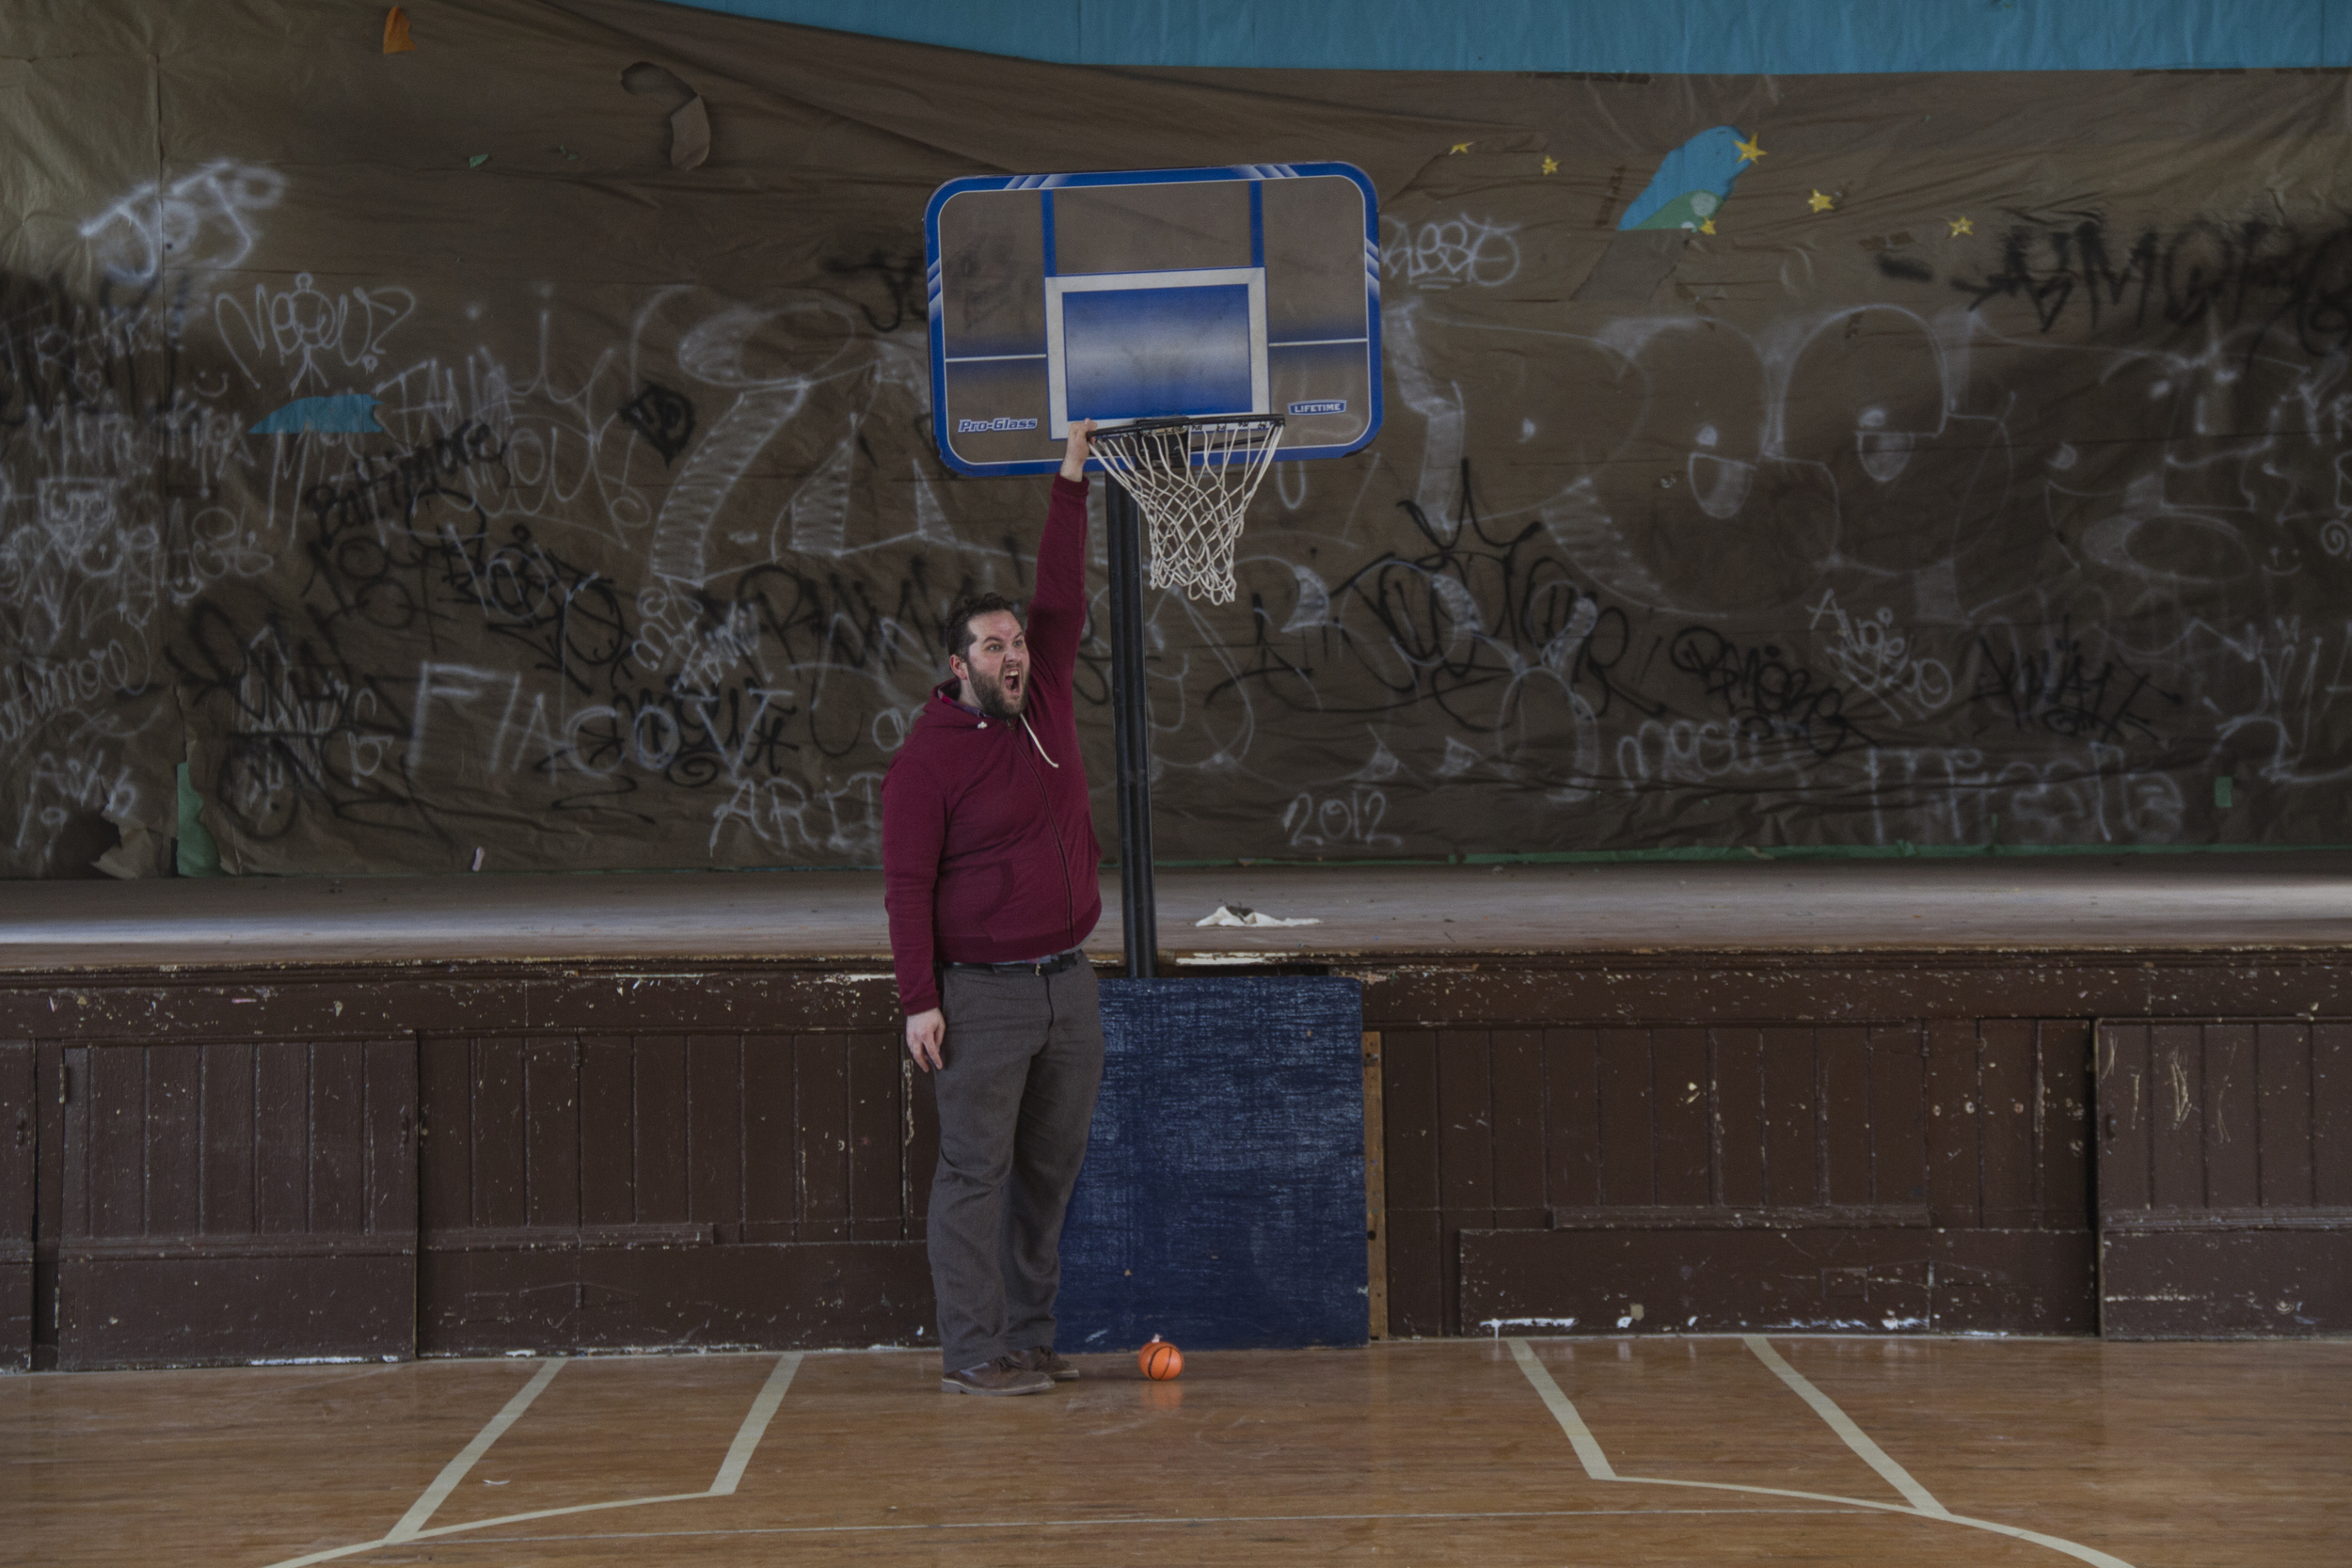 Paul_Shortt_Basketball